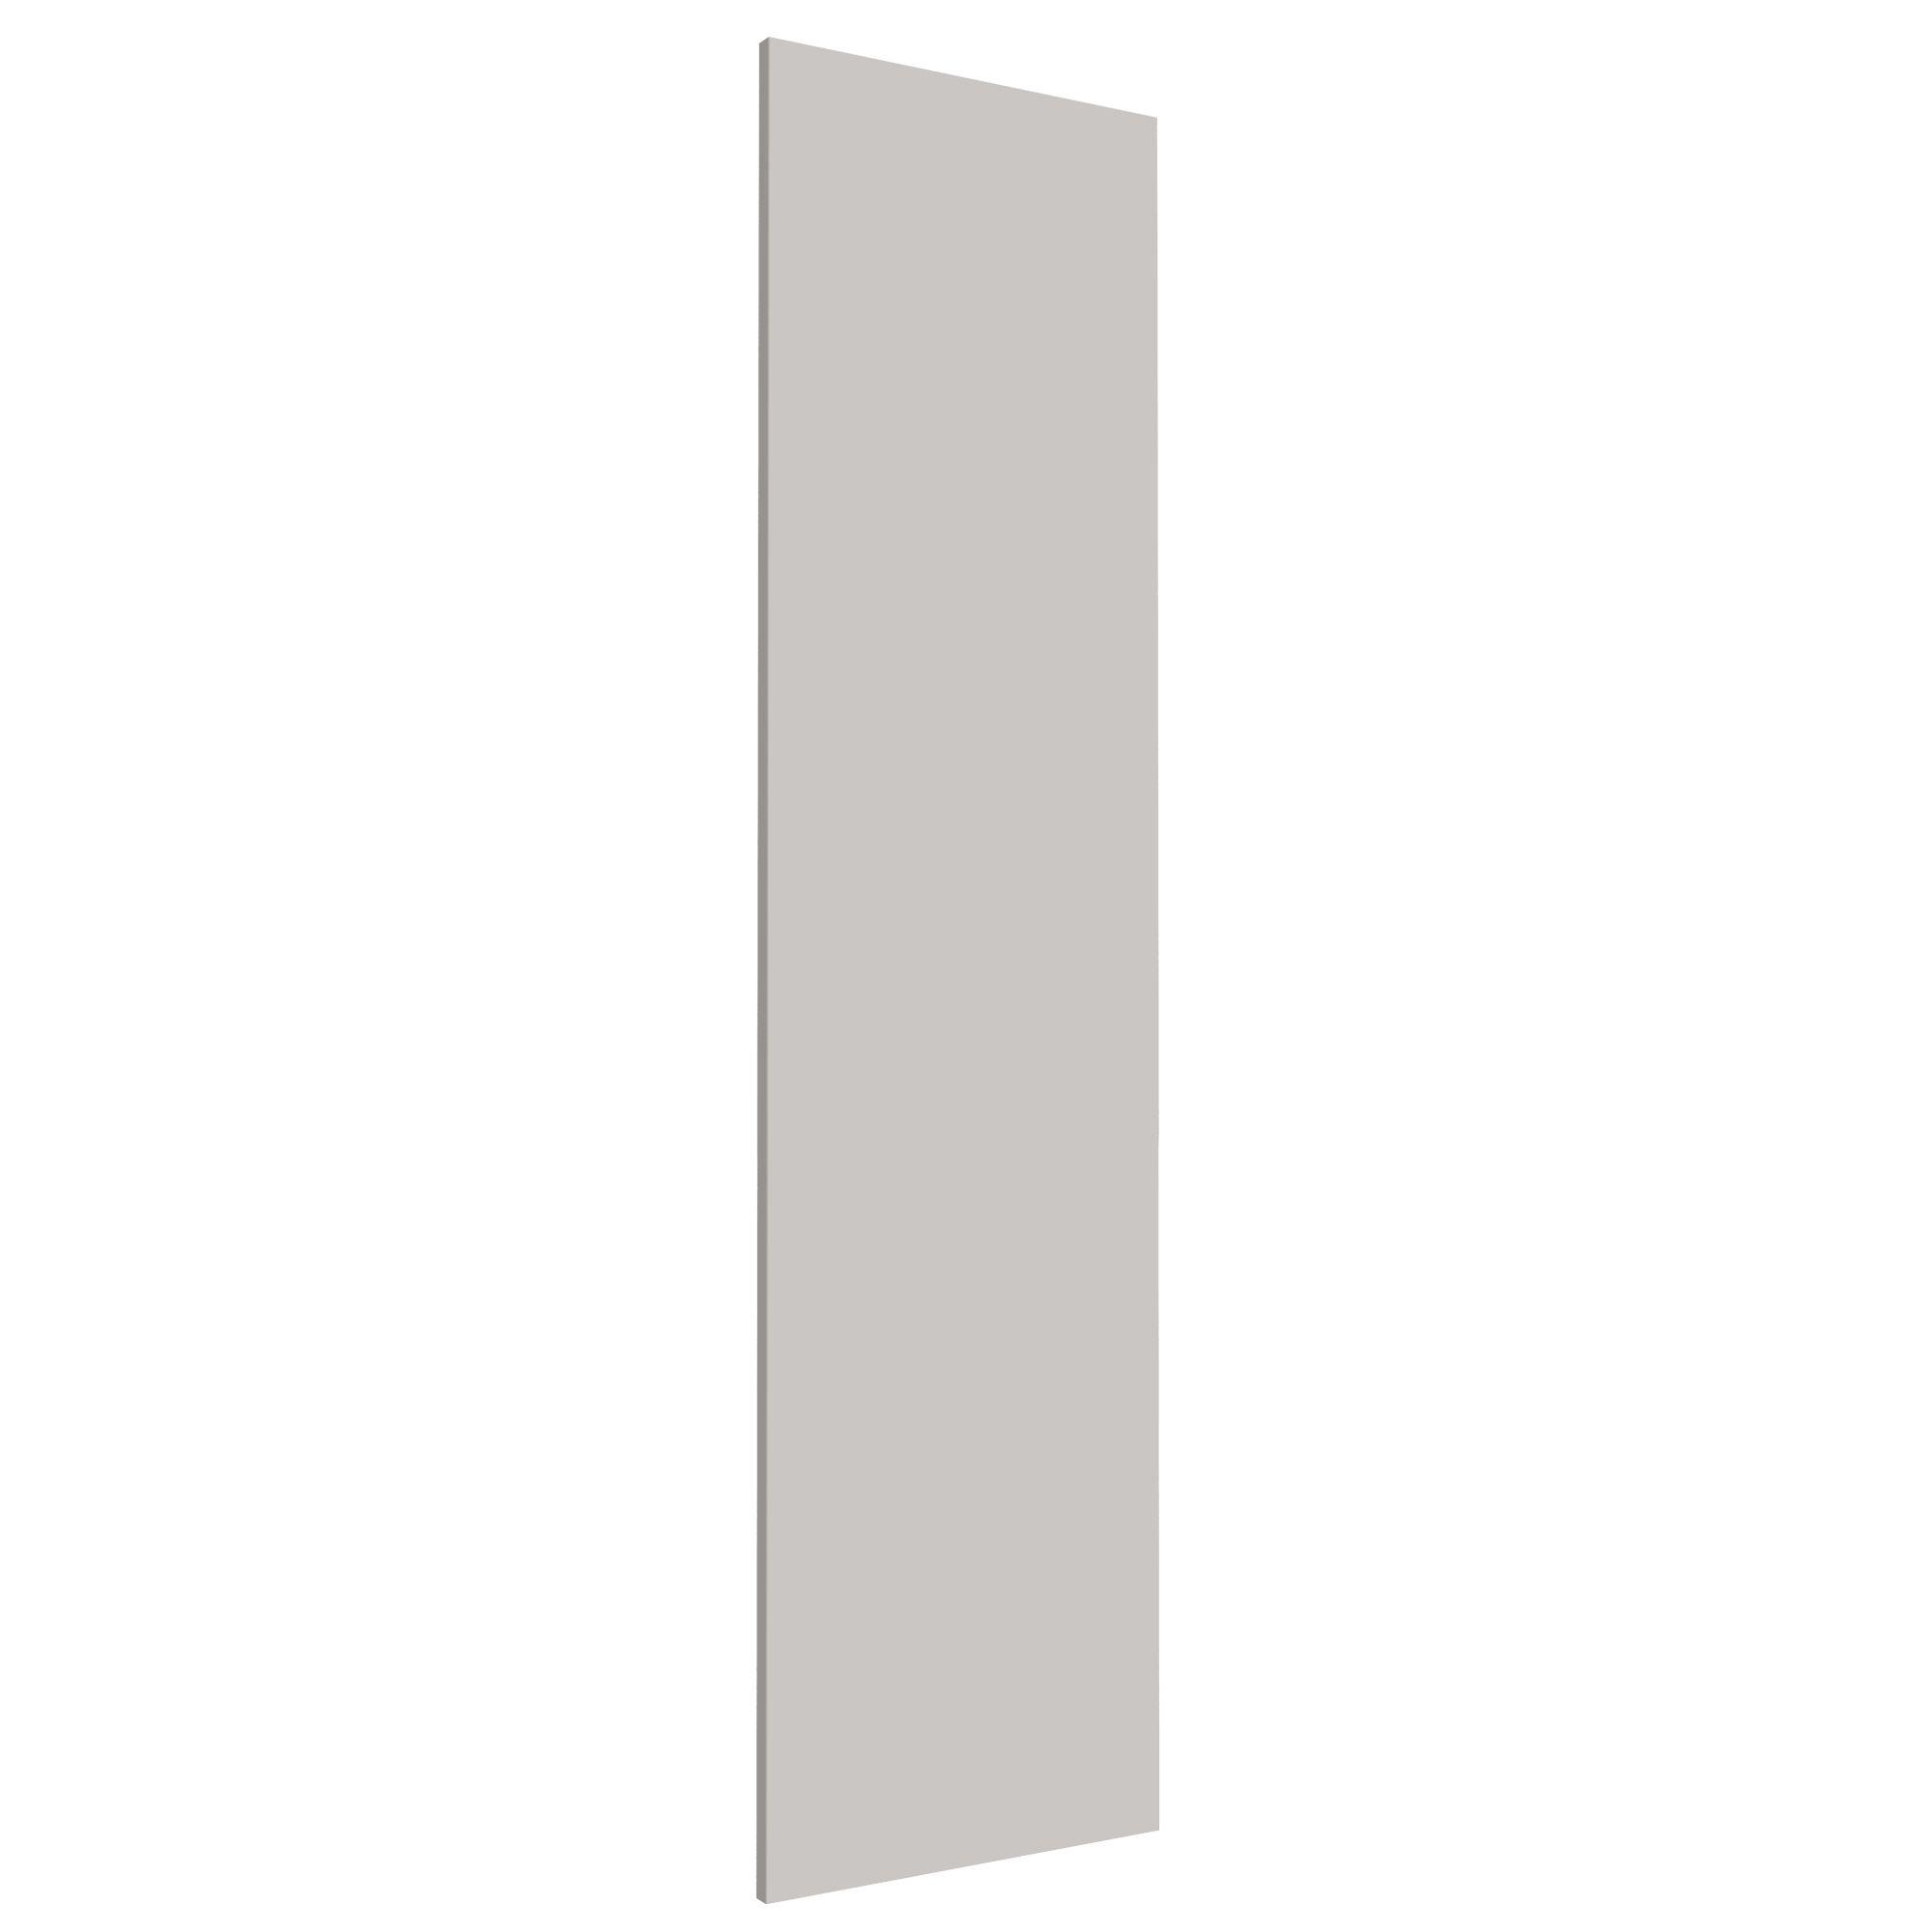 Darwin Modular Grey & Matt Wardrobe Door (h)1456mm (w)372mm (d)16mm